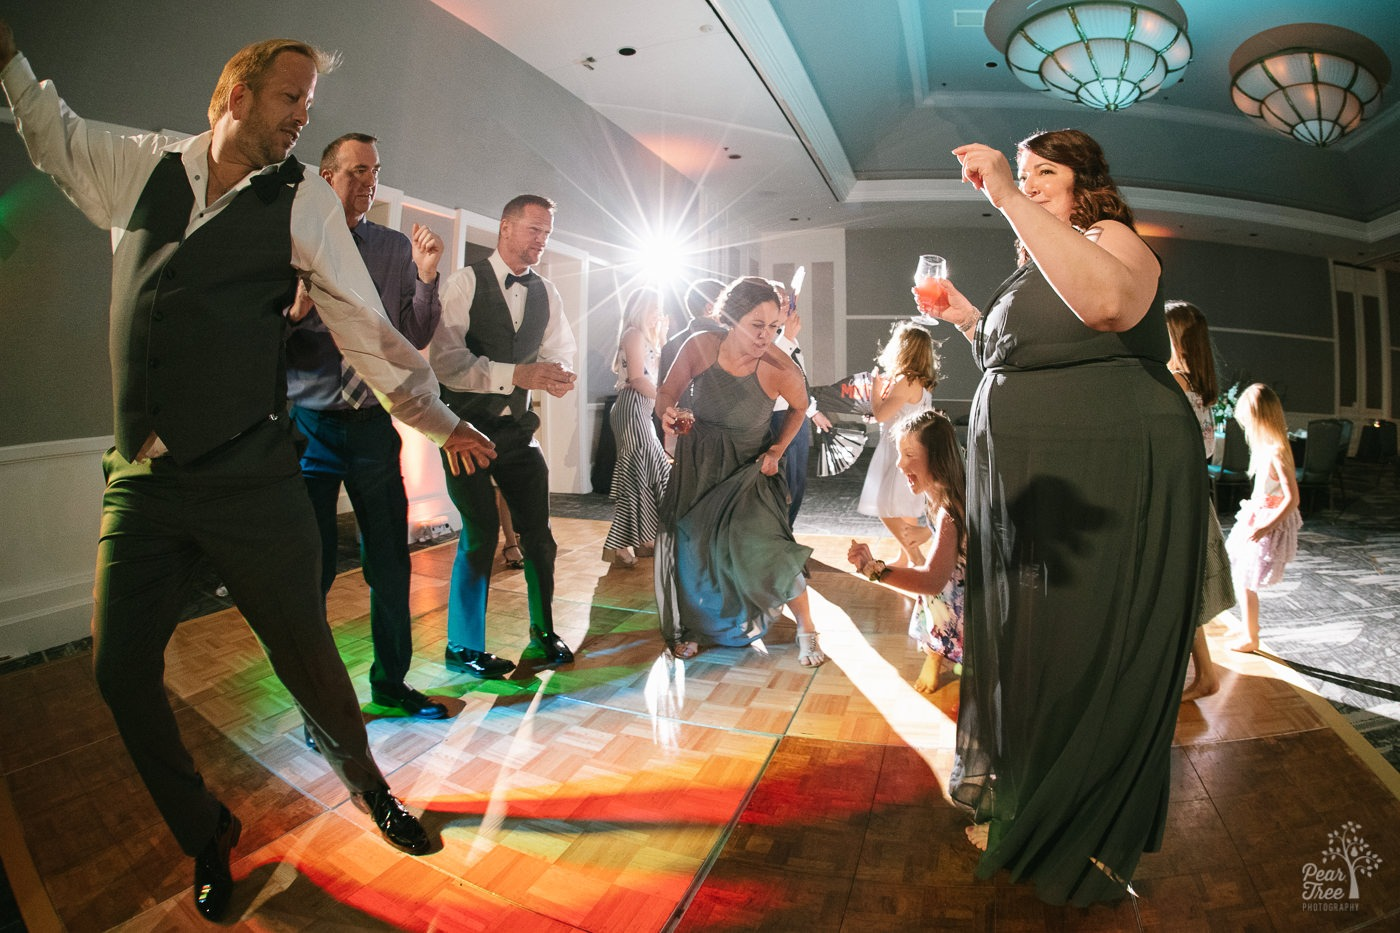 Groomsmen dancing with Matron of Honor, Maid of Honor, and children on dance floor.